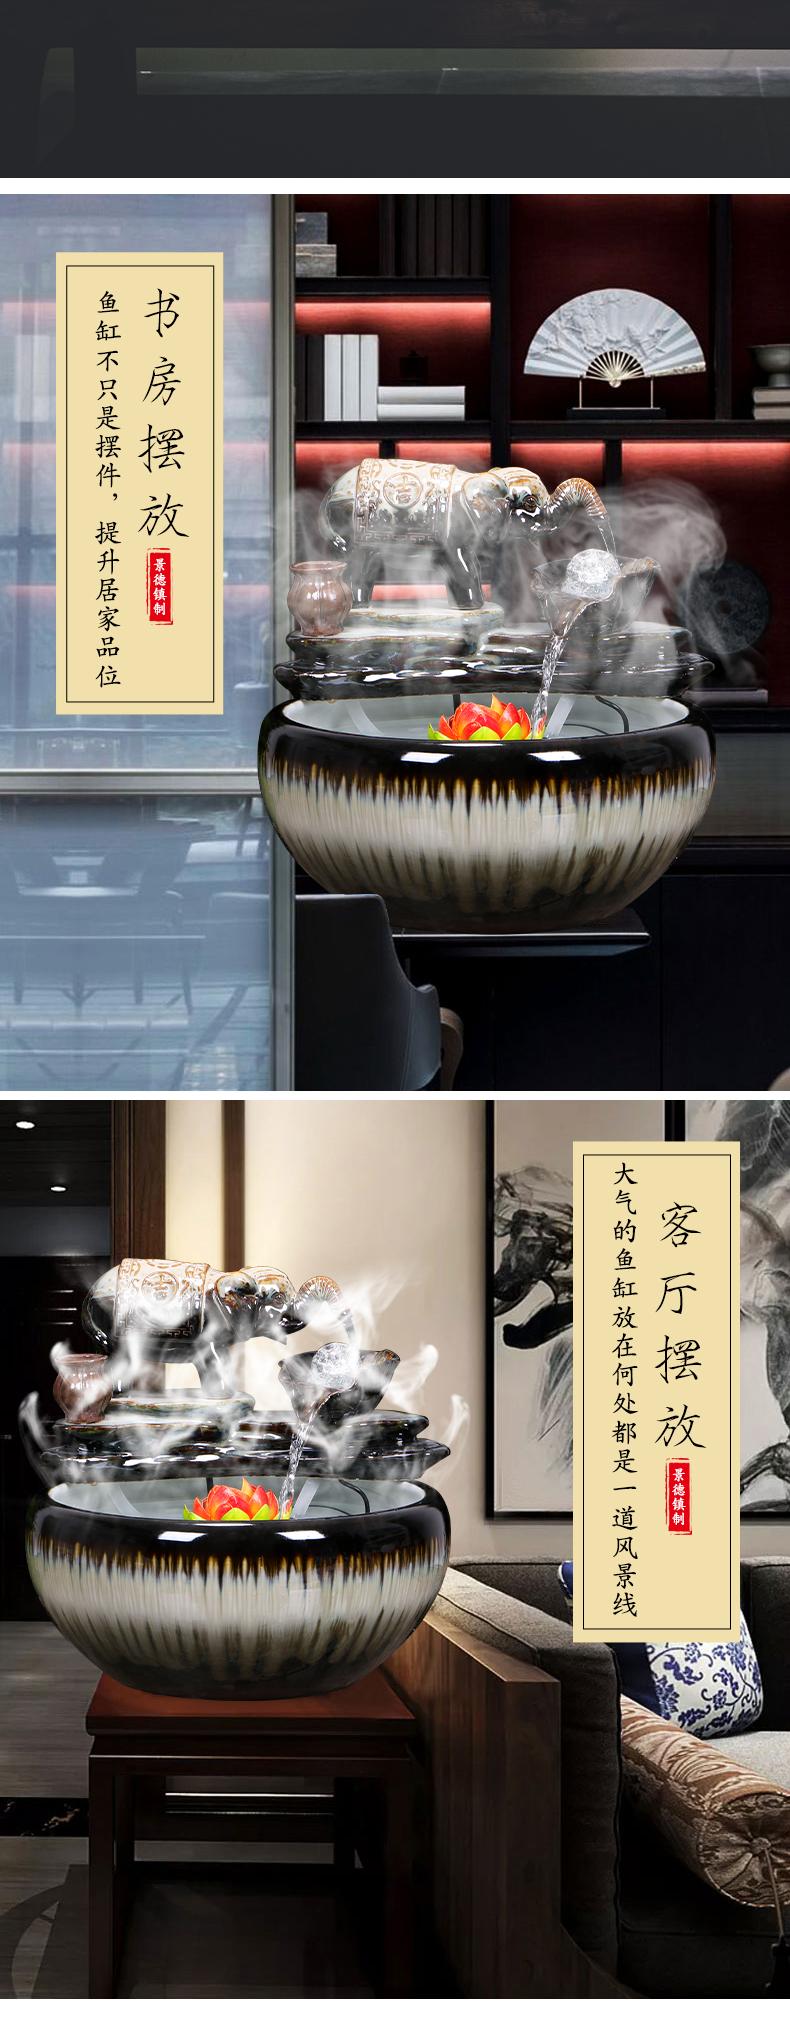 Jingdezhen ceramic aquarium water fountain creative small fish from cycle furnishing articles home sitting room a goldfish bowl